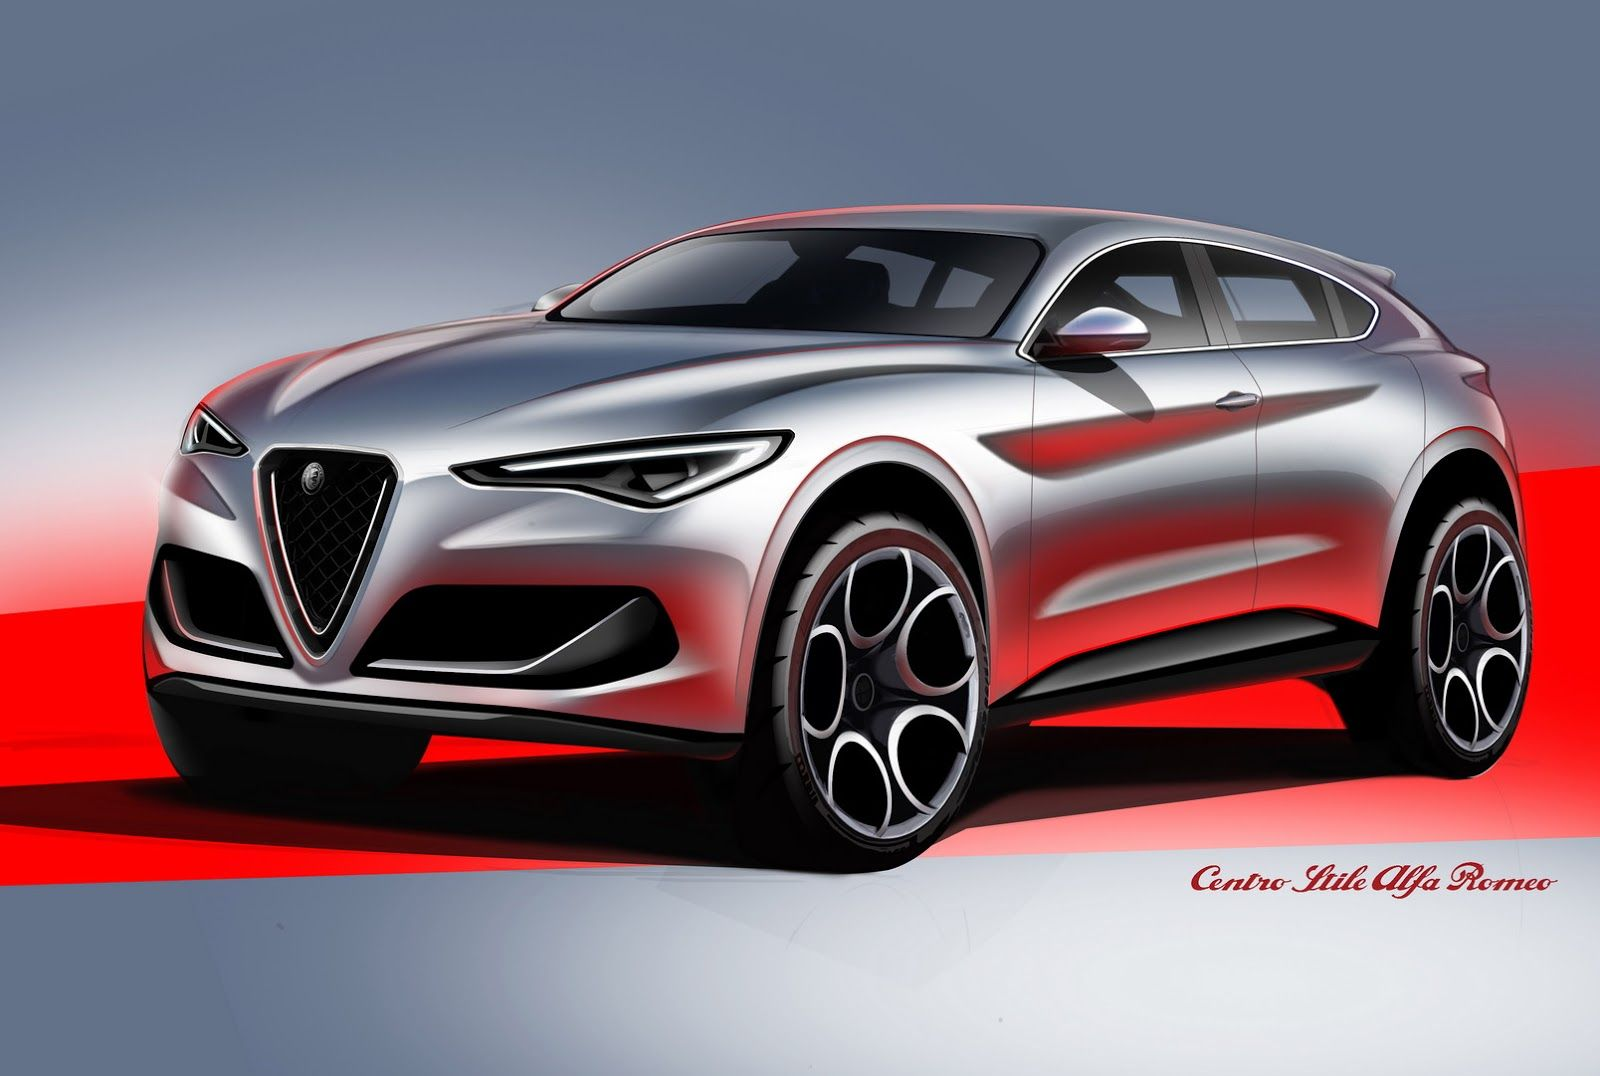 Alfa Romeo Stelvio Mobil Konsep Mobil Teknologi